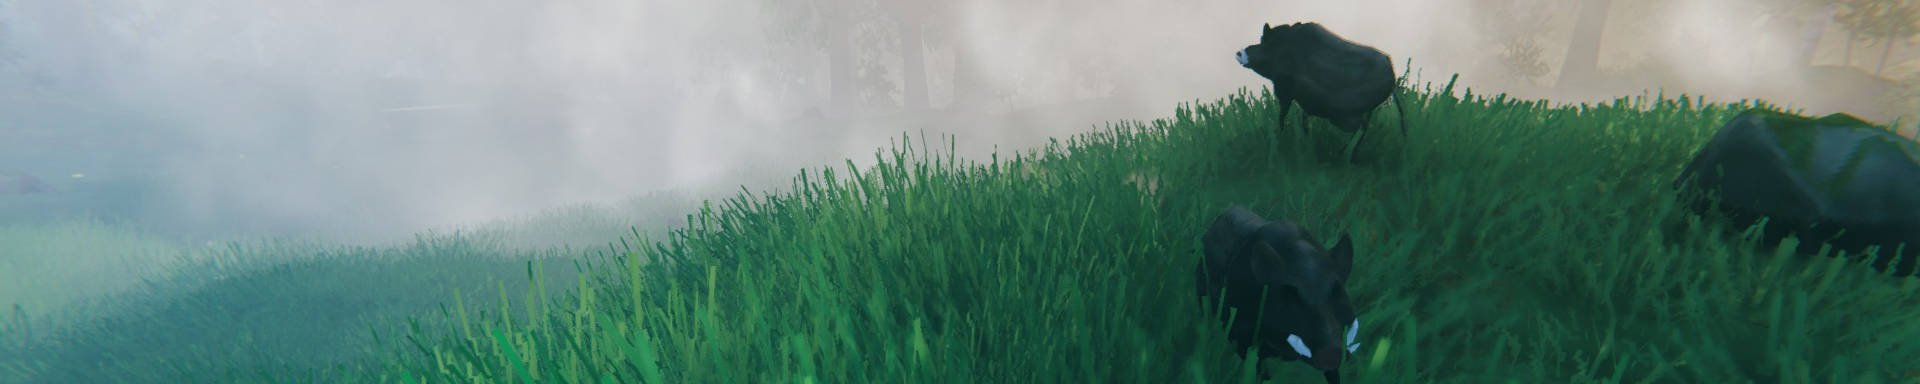 Valheim The Forest is Moving Base Raids Guide Eikyhtr Rallies